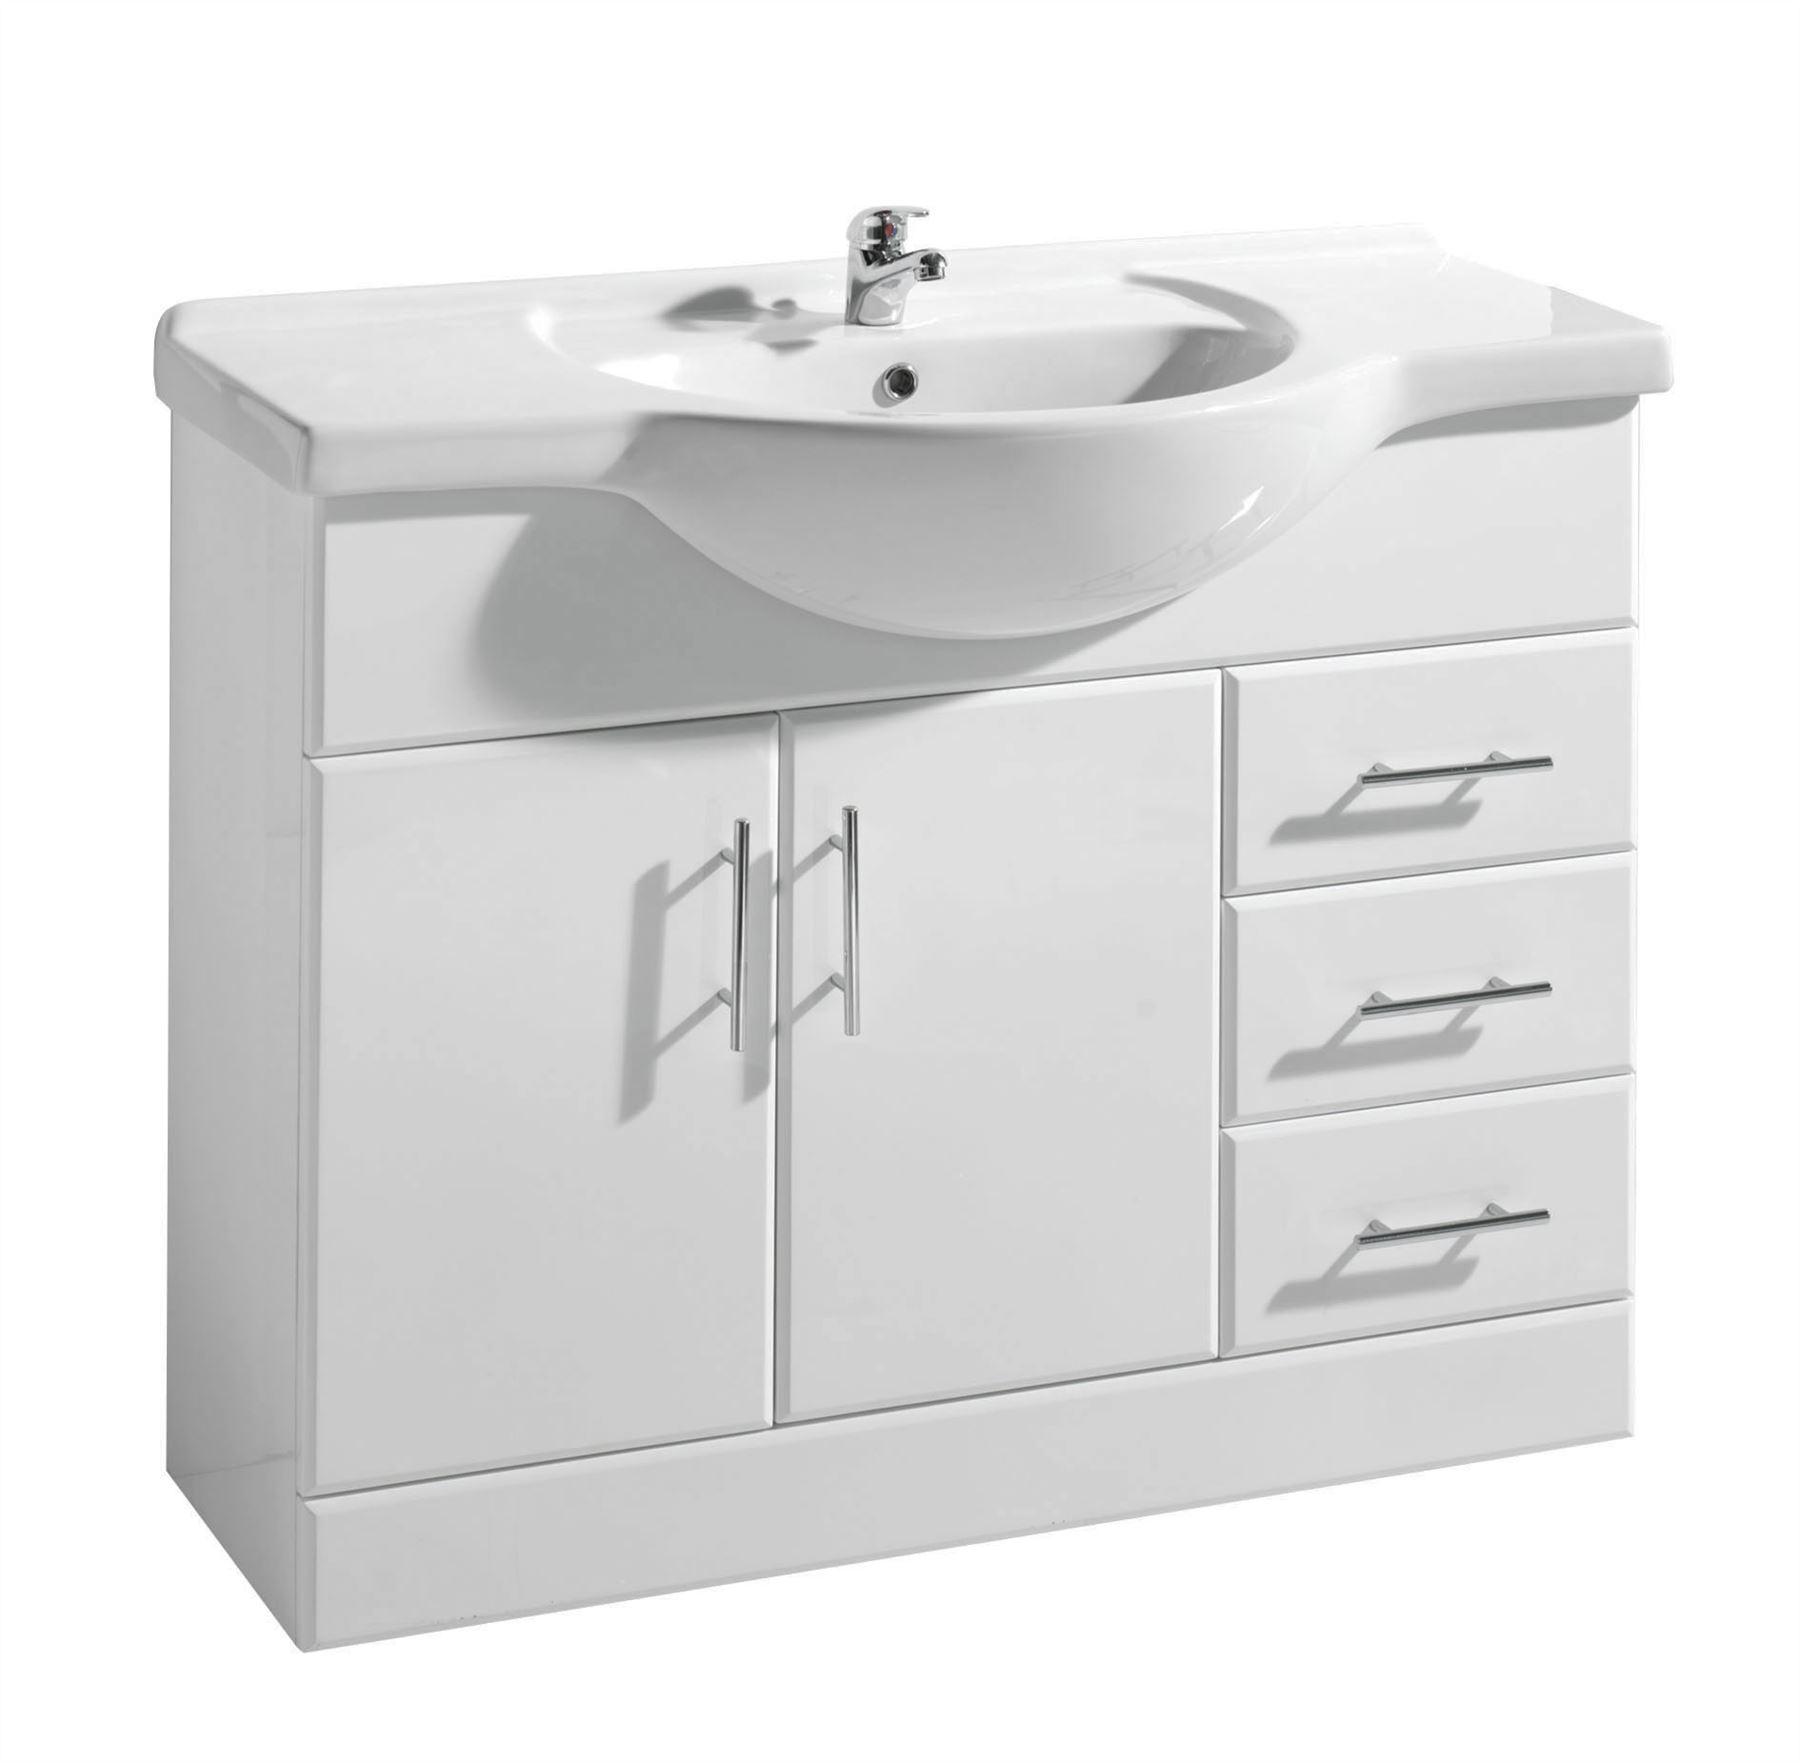 gloss white bathroom cloakroom vanity unit cabinet compact. Black Bedroom Furniture Sets. Home Design Ideas